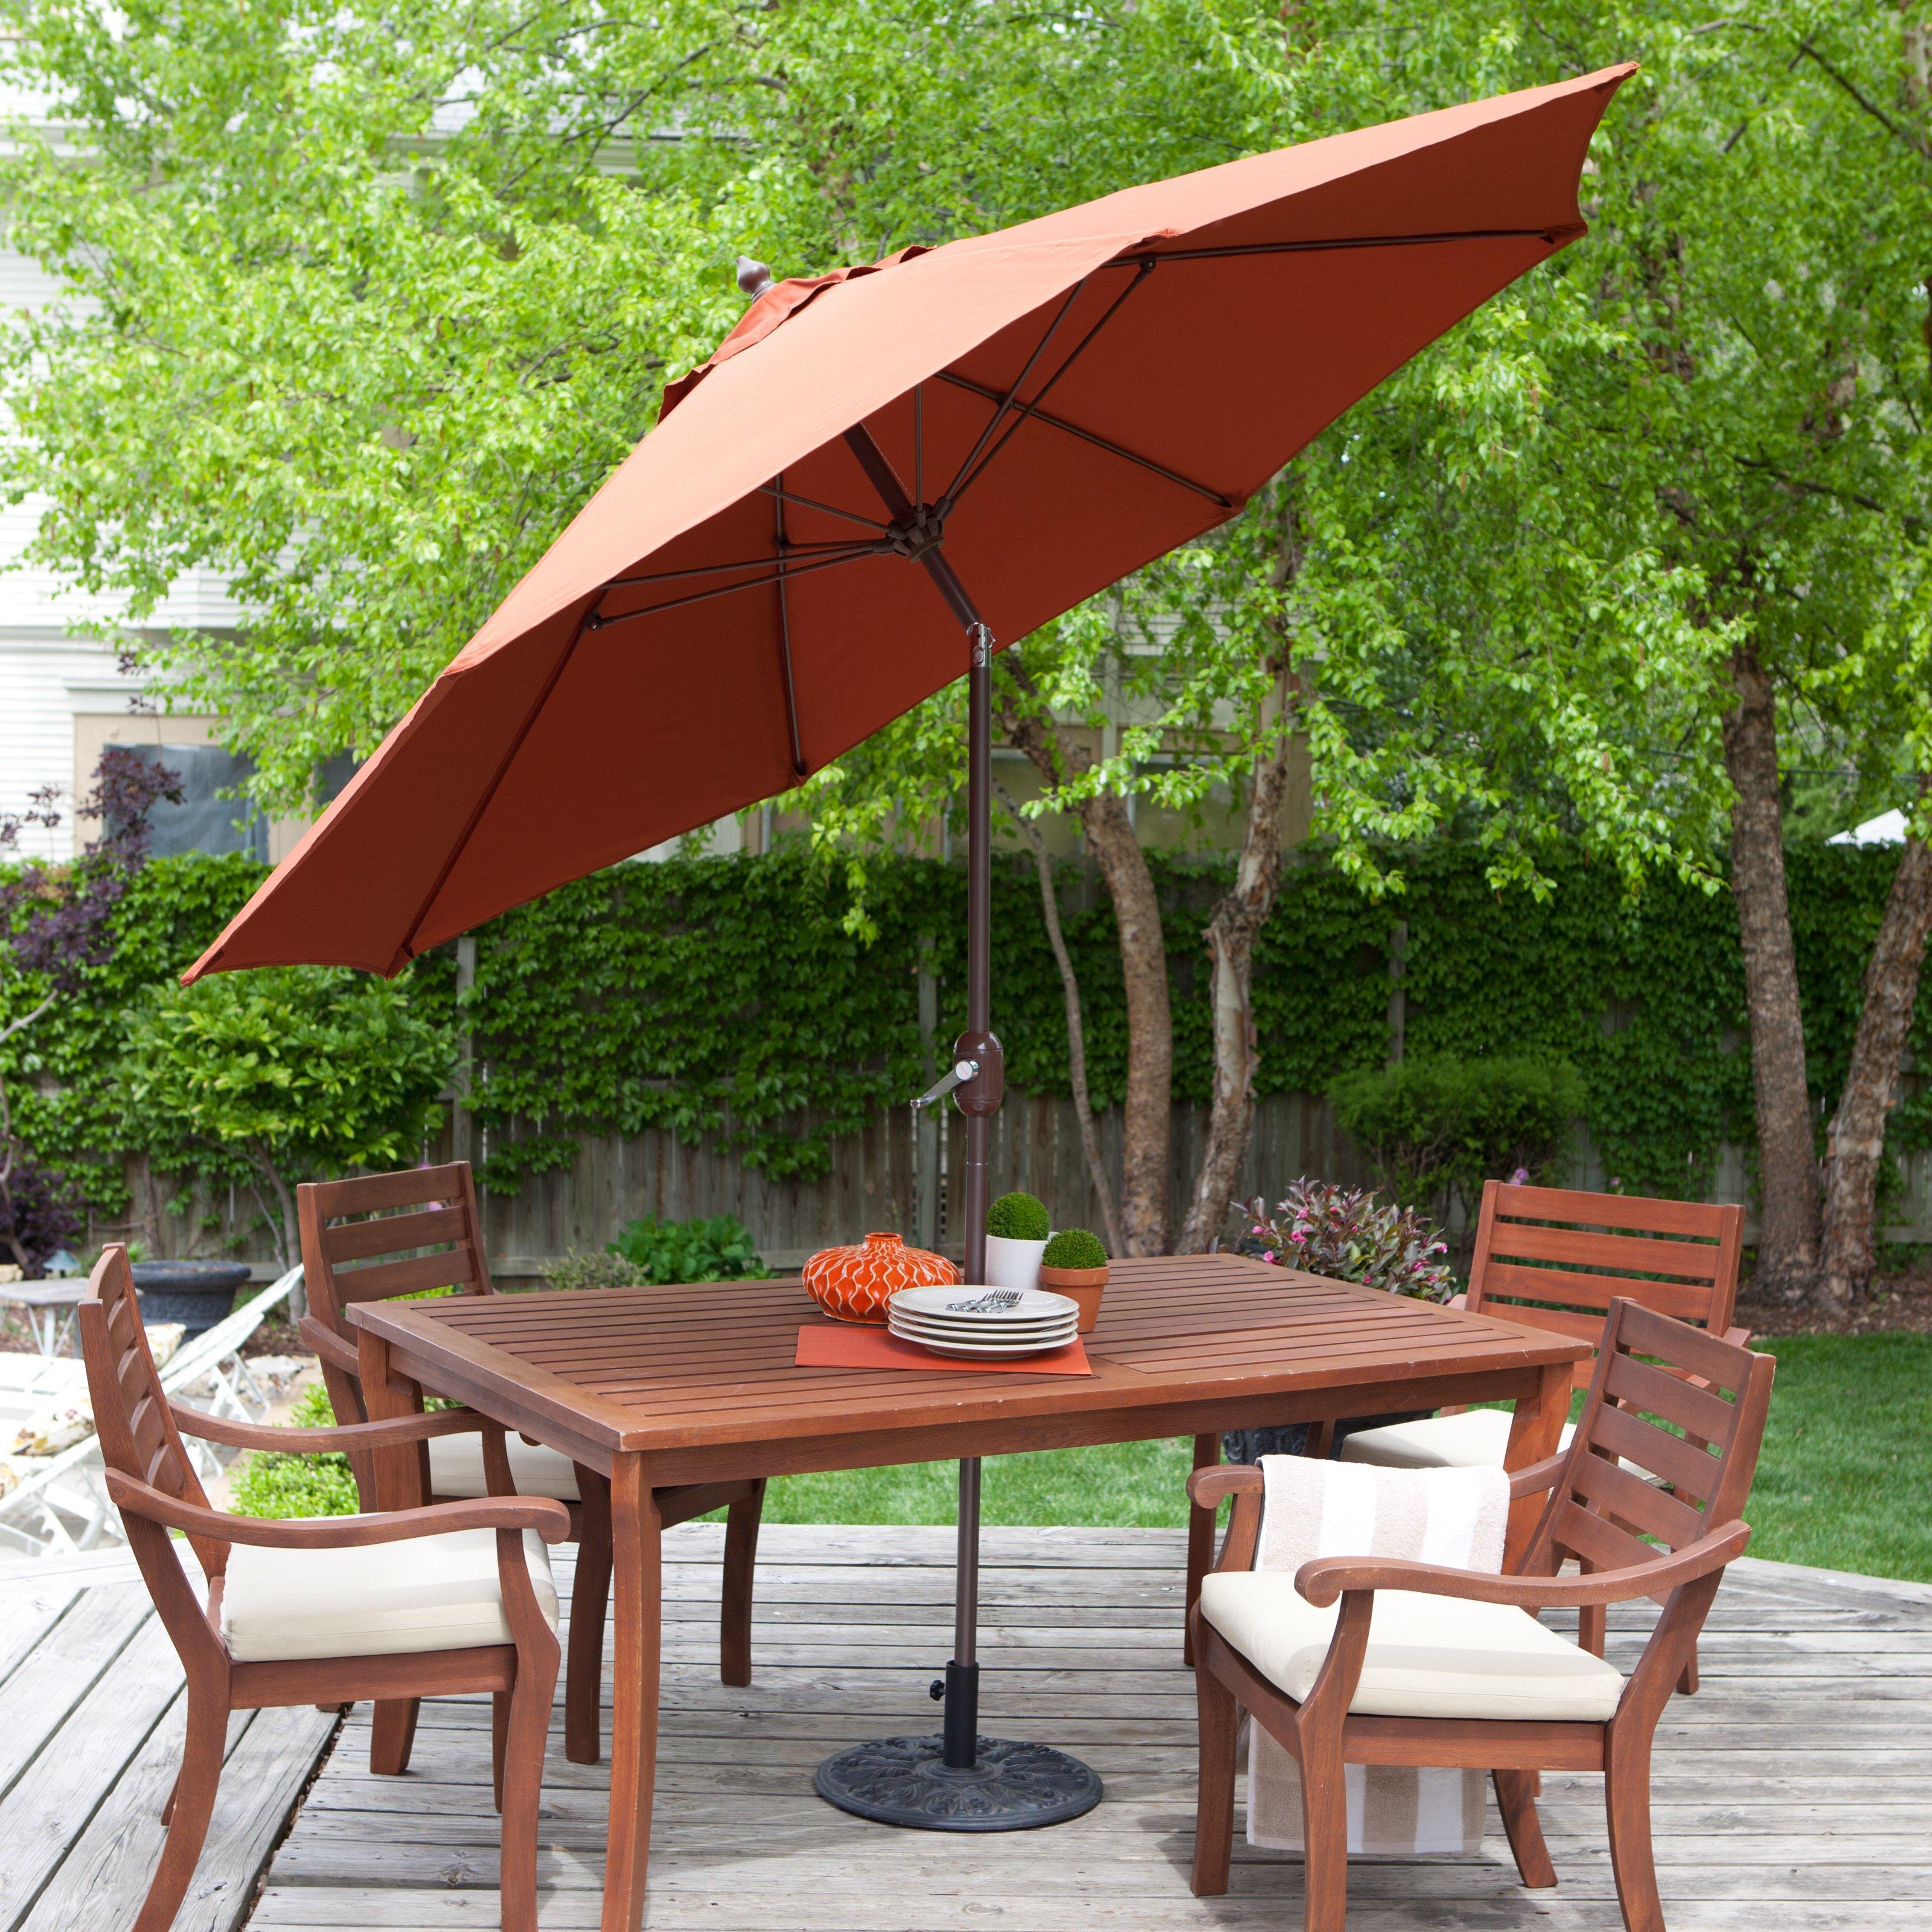 push button tilt patio umbrella with 40 lb base included walmartcom - Patio Table Umbrella